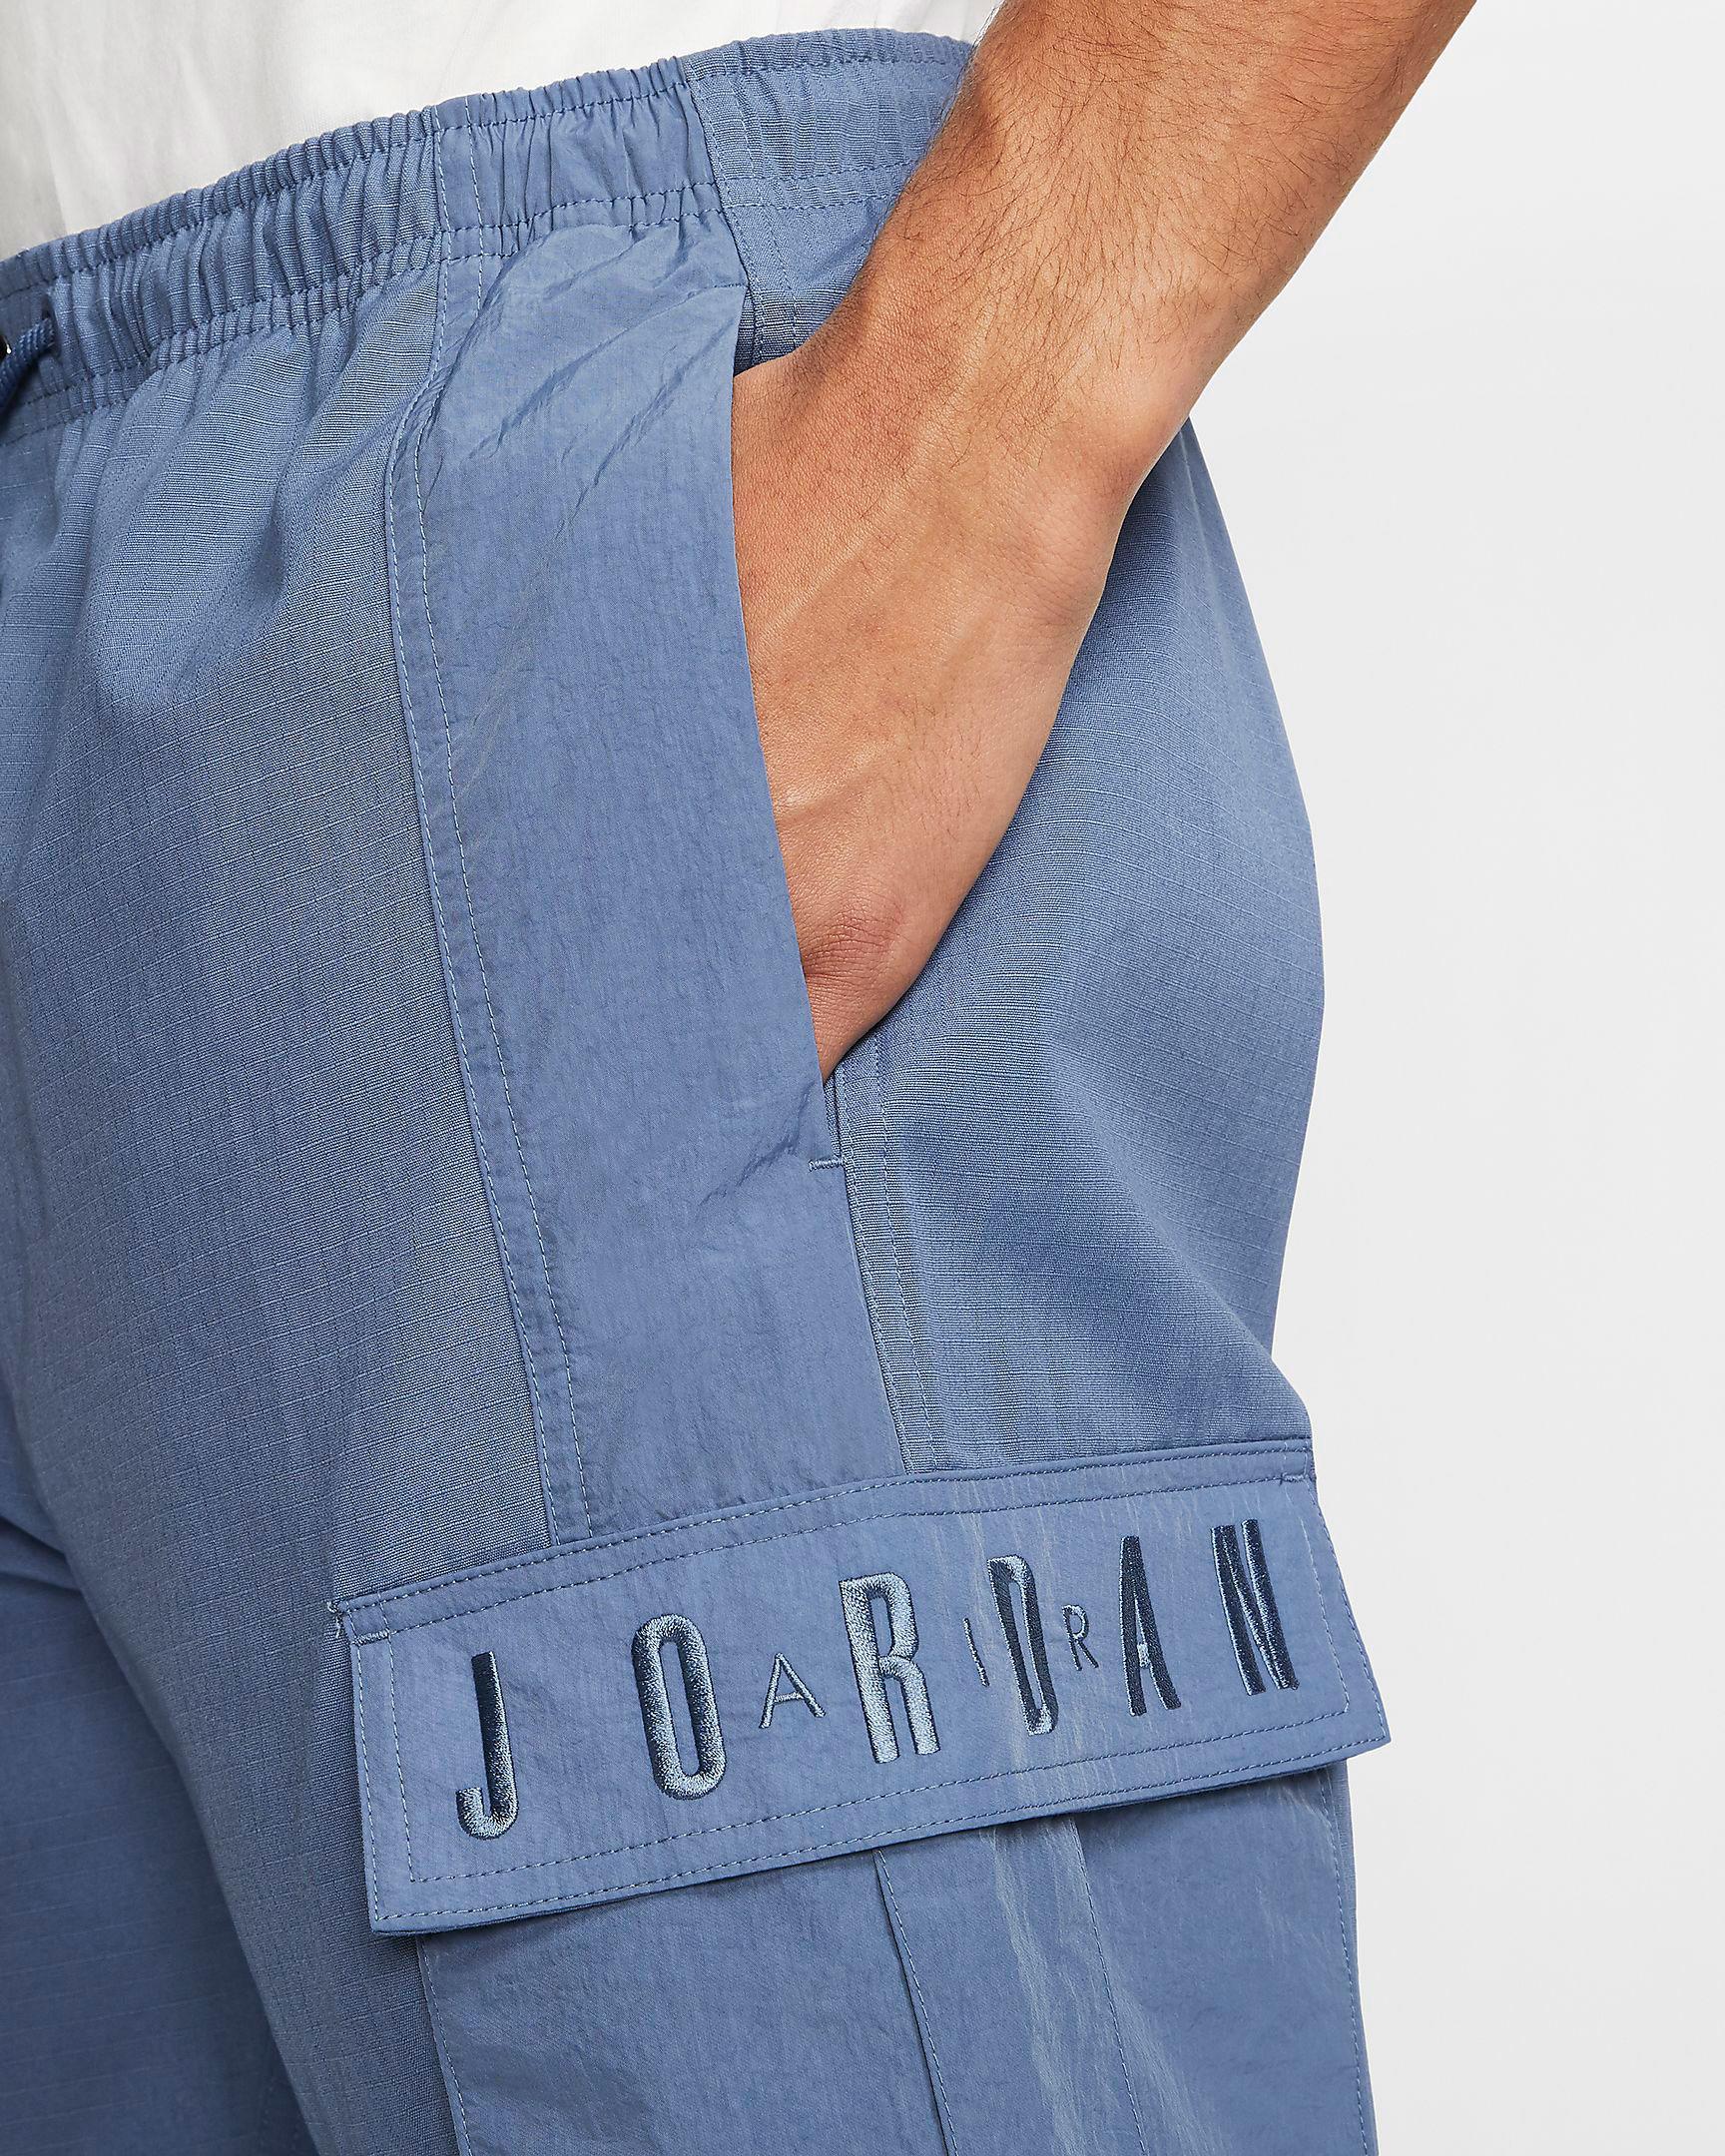 jordan-sport-dna-cargo-pants-navy-blue-7